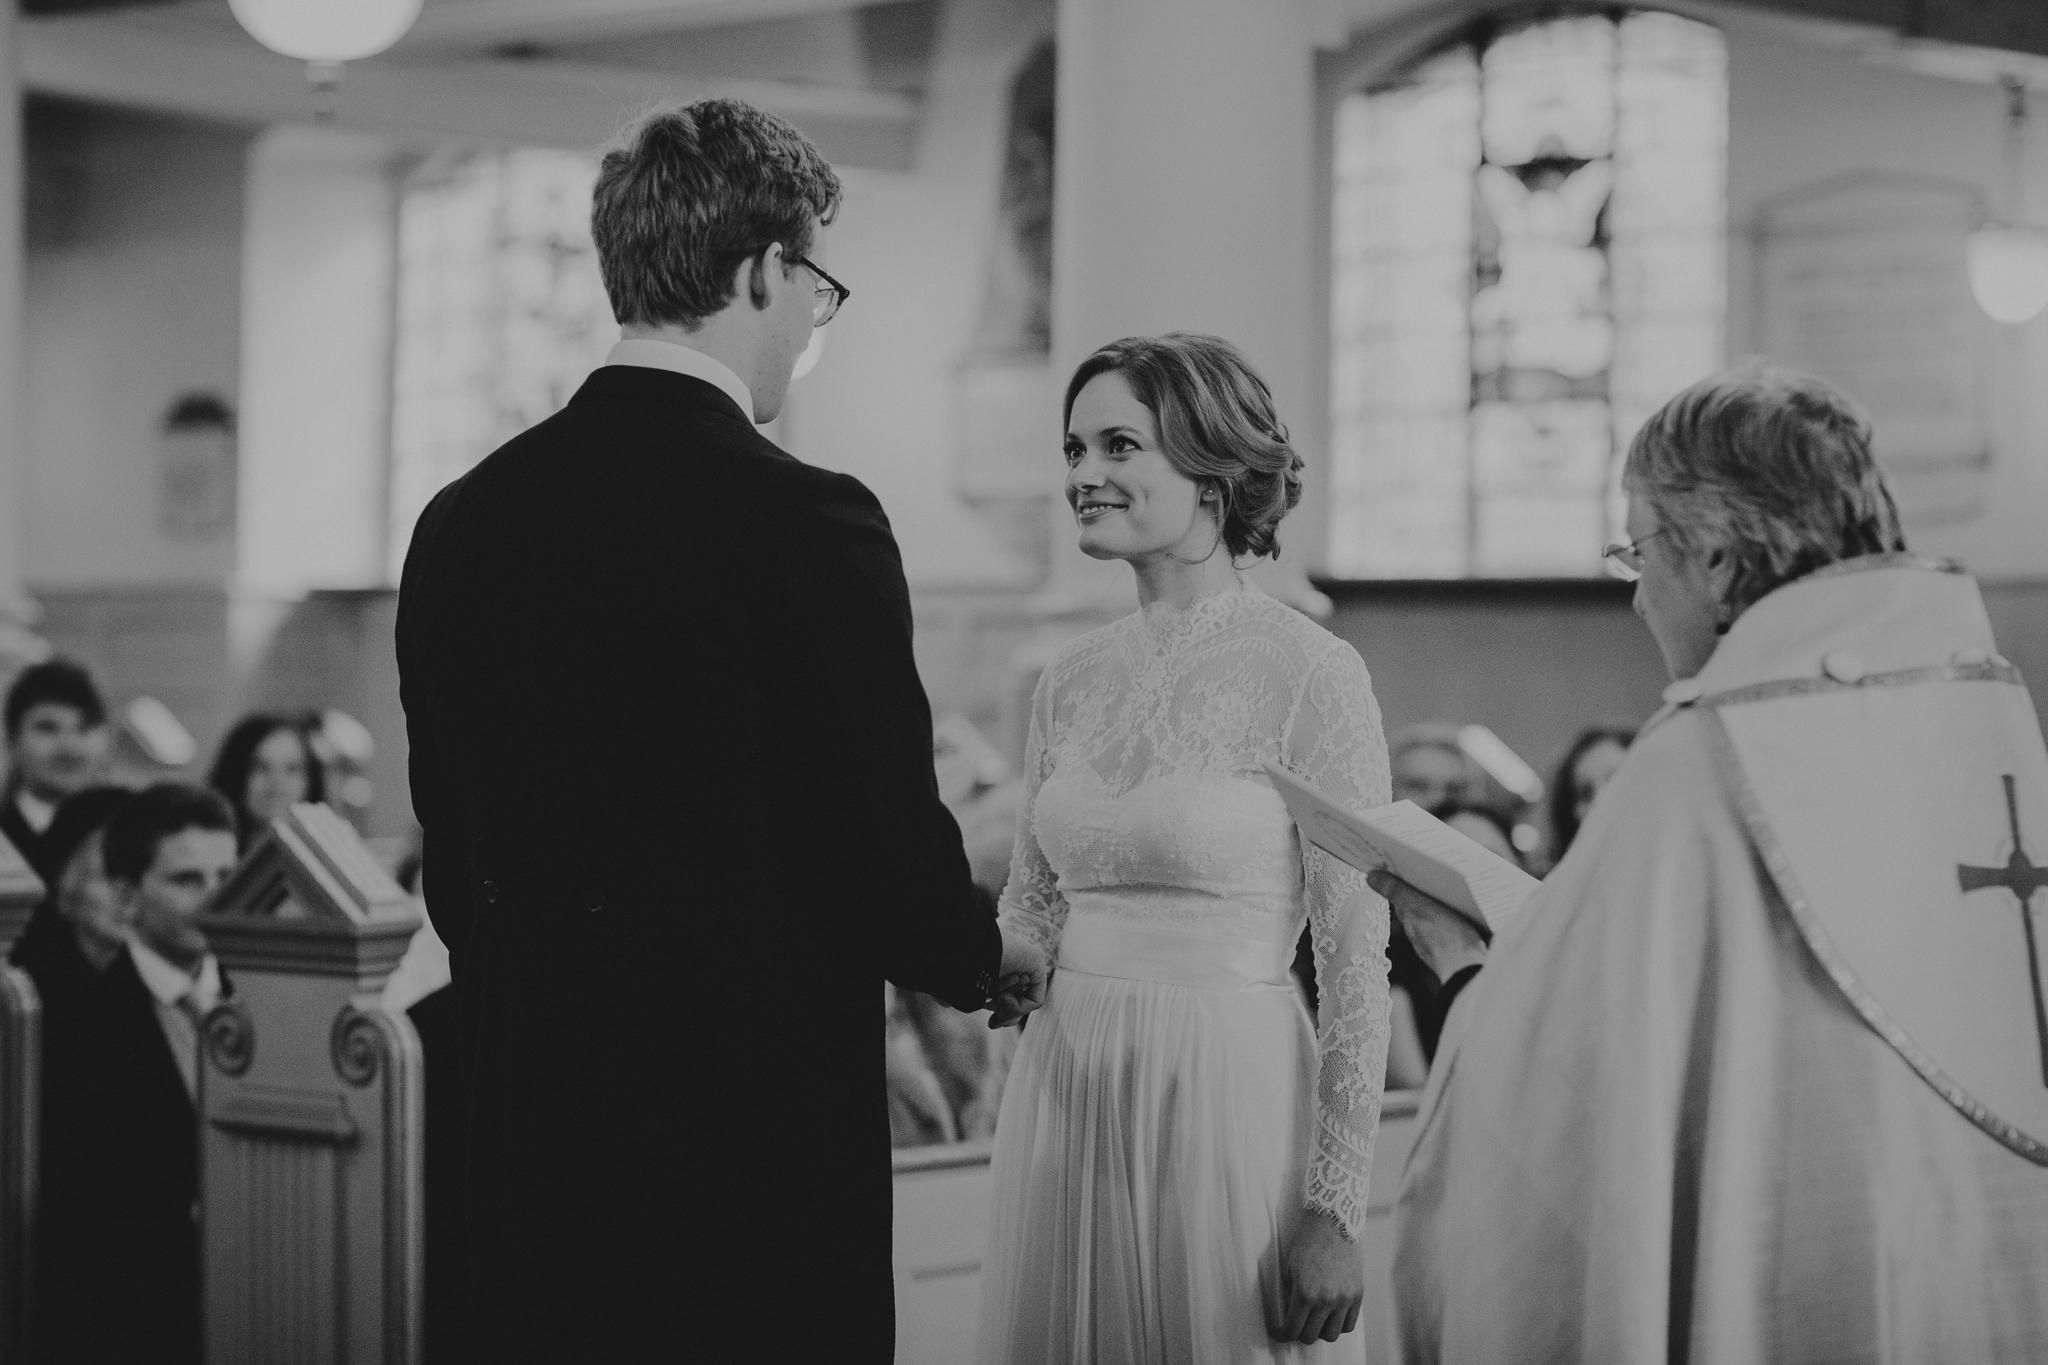 hampstead_wedding_photography_kate_gray-10.jpg